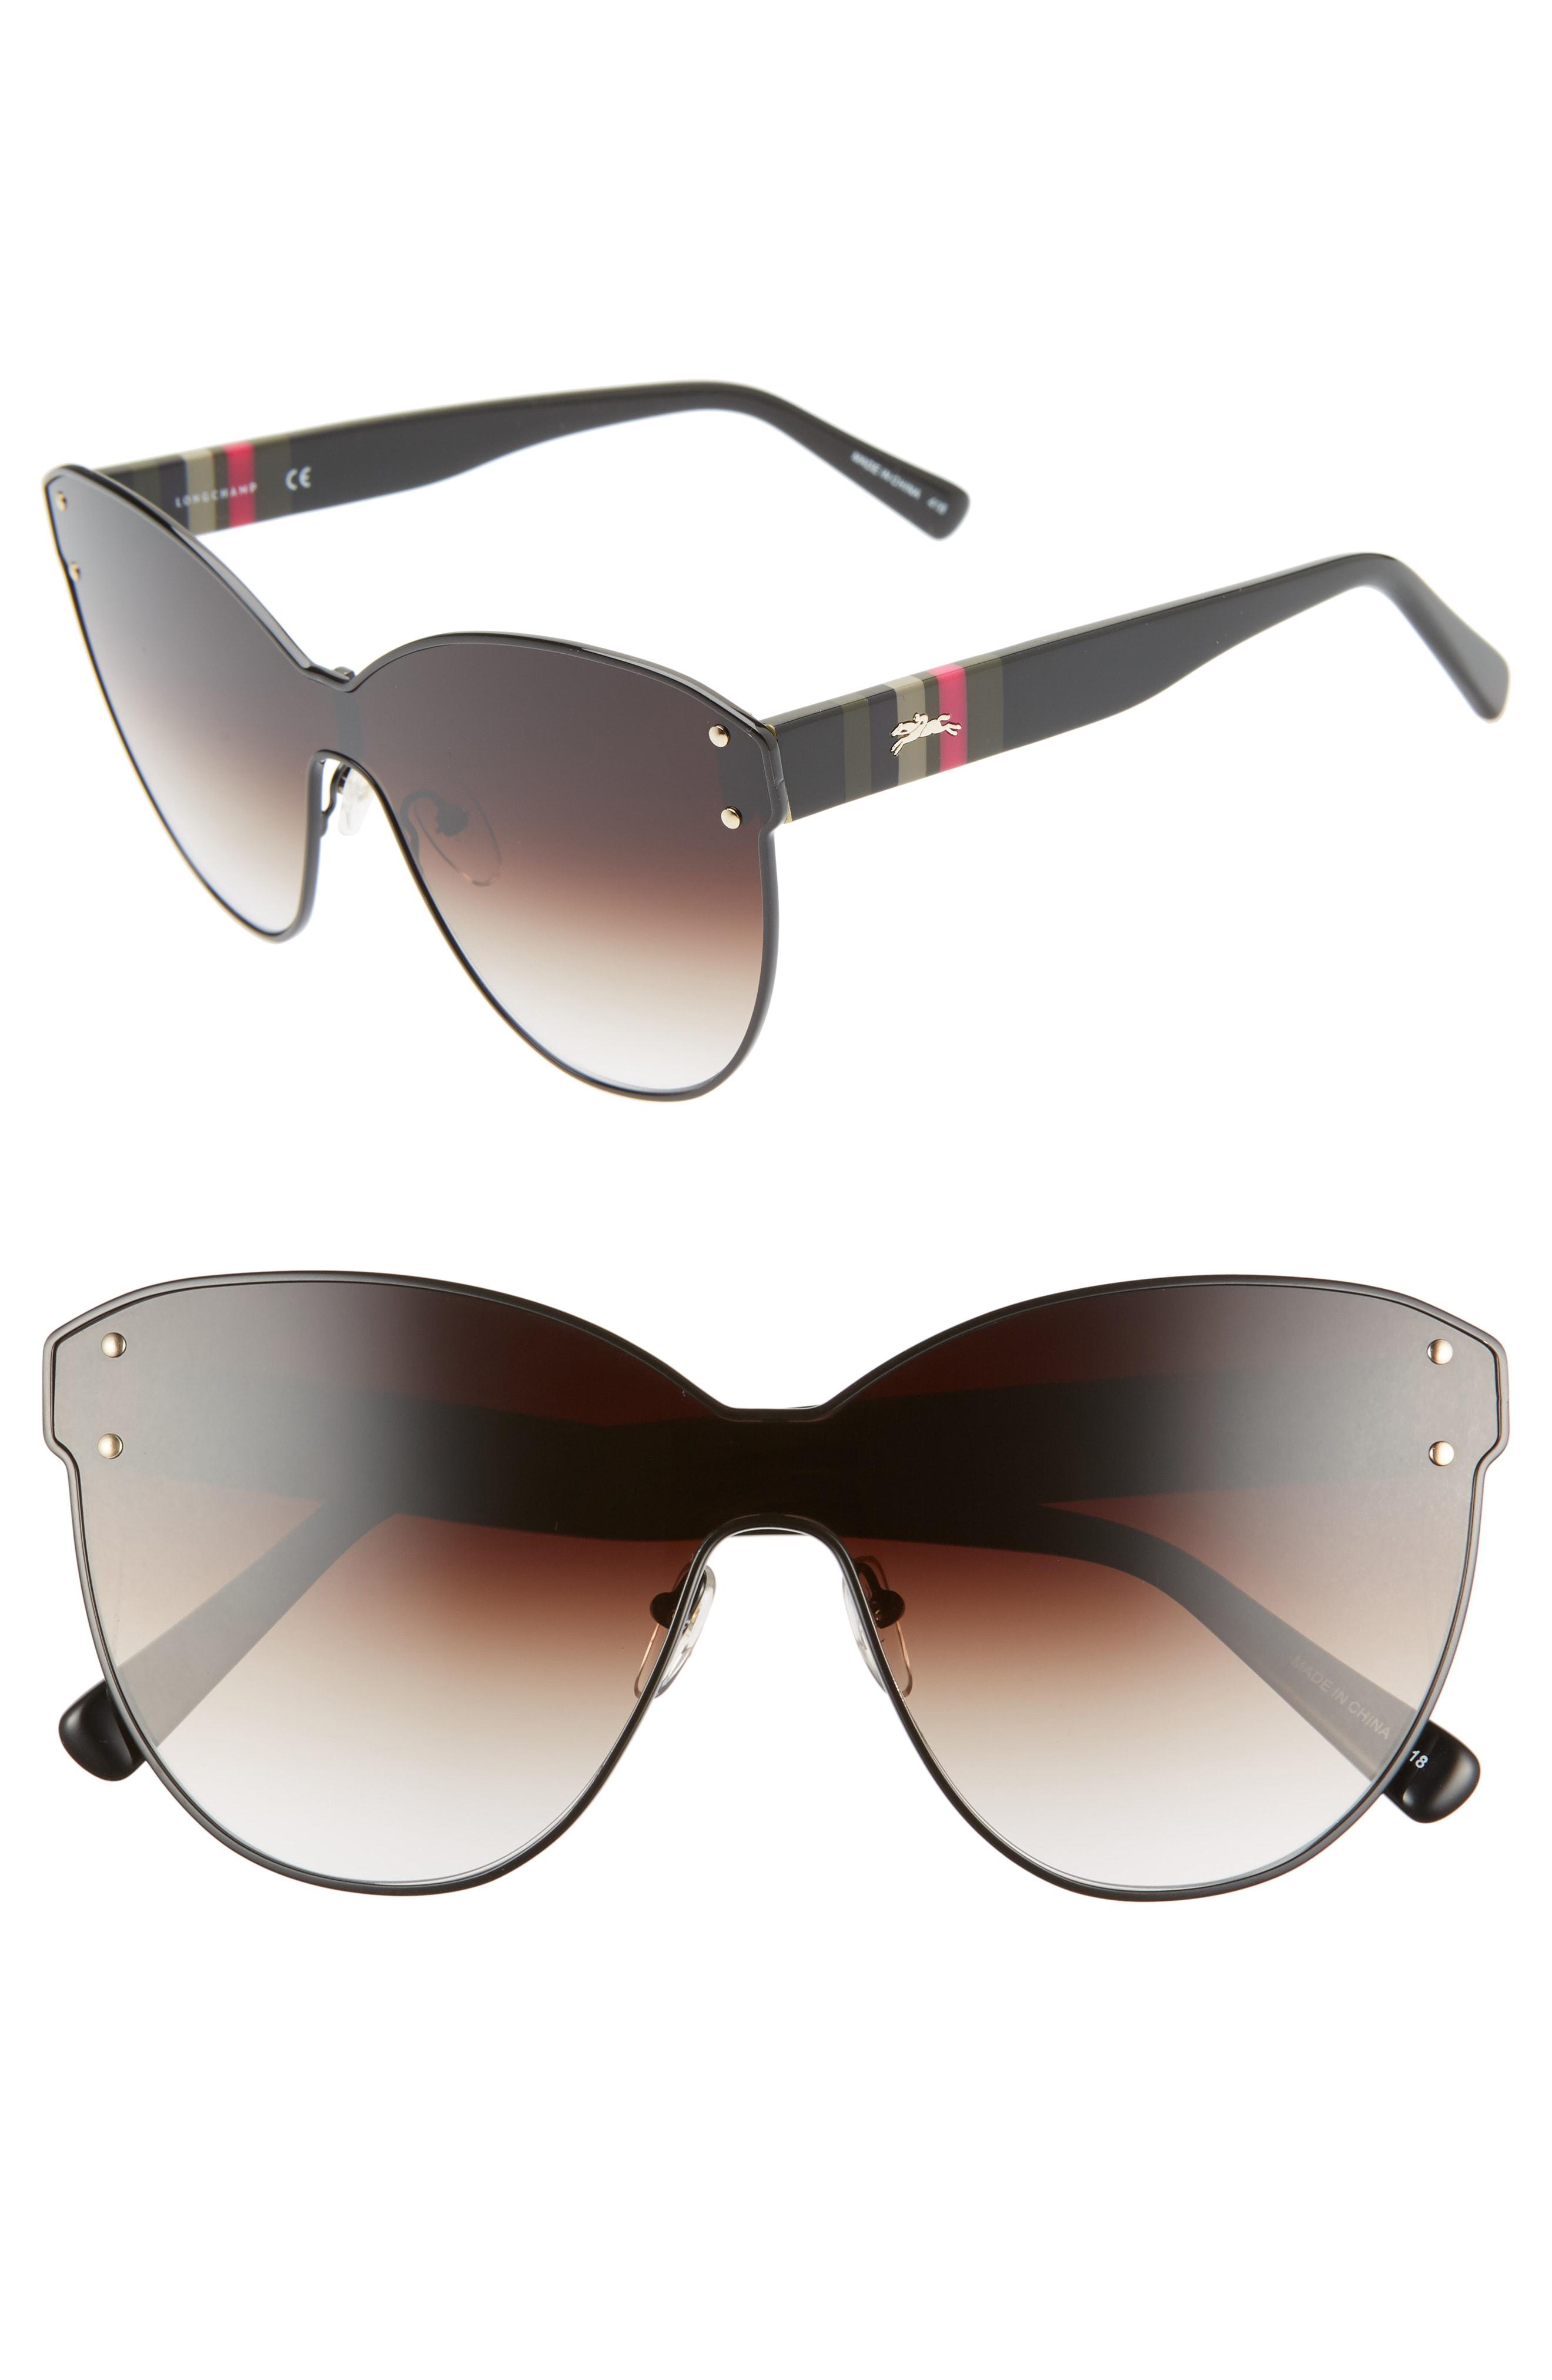 94c498d43786 Longchamp Heritage Stripe 62Mm Oversize Shield Sunglasses - Black ...